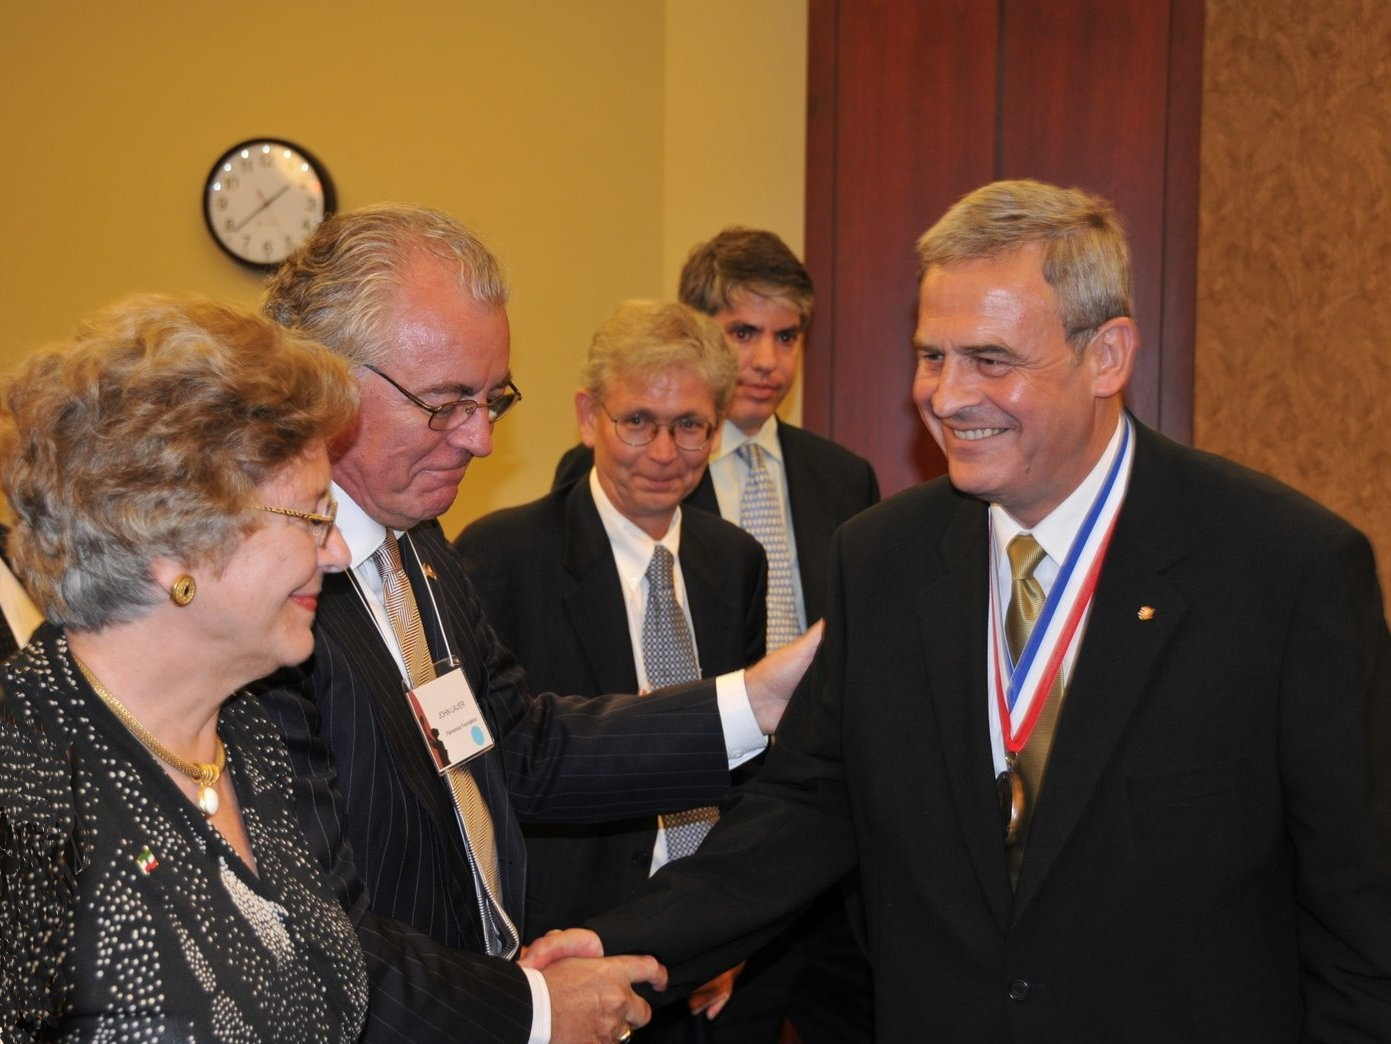 Mrs. Edith Lauer, Mr. John Lauer, Mr. László Hámos and Mr. Maximilian Teleki congratulate to Bishop Tőkés Truman-Reagan Freedom Medal VOC